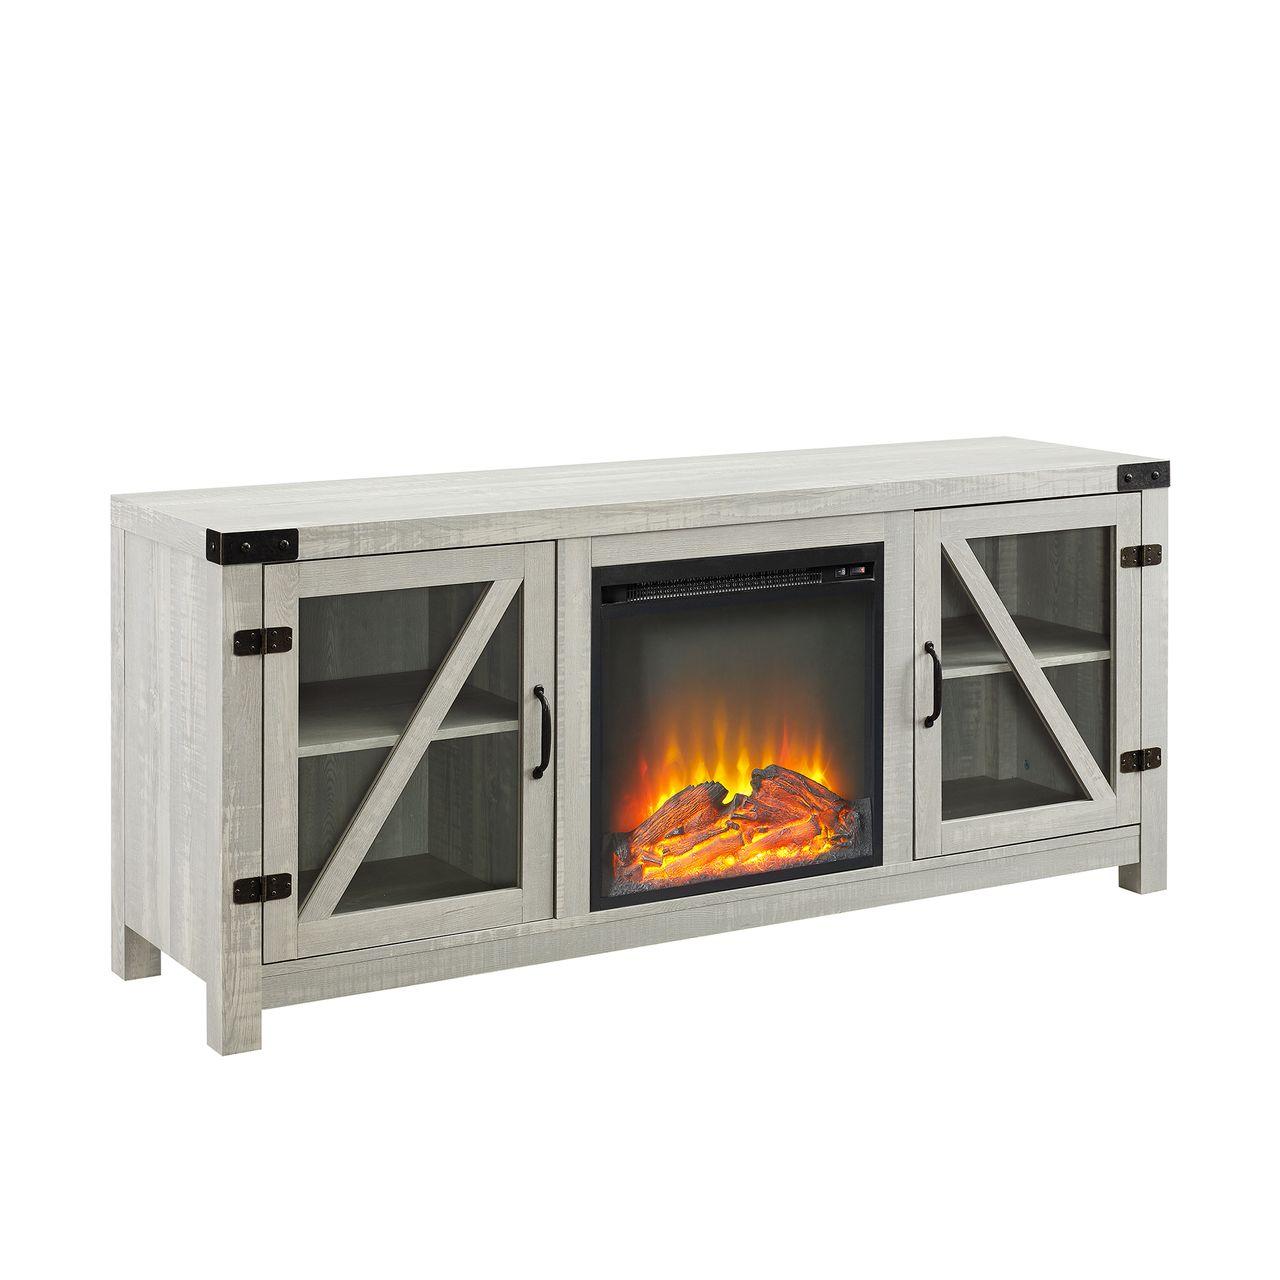 "Walker Edison 58"" Glass Barn Door Fireplace Console - Stone Grey"